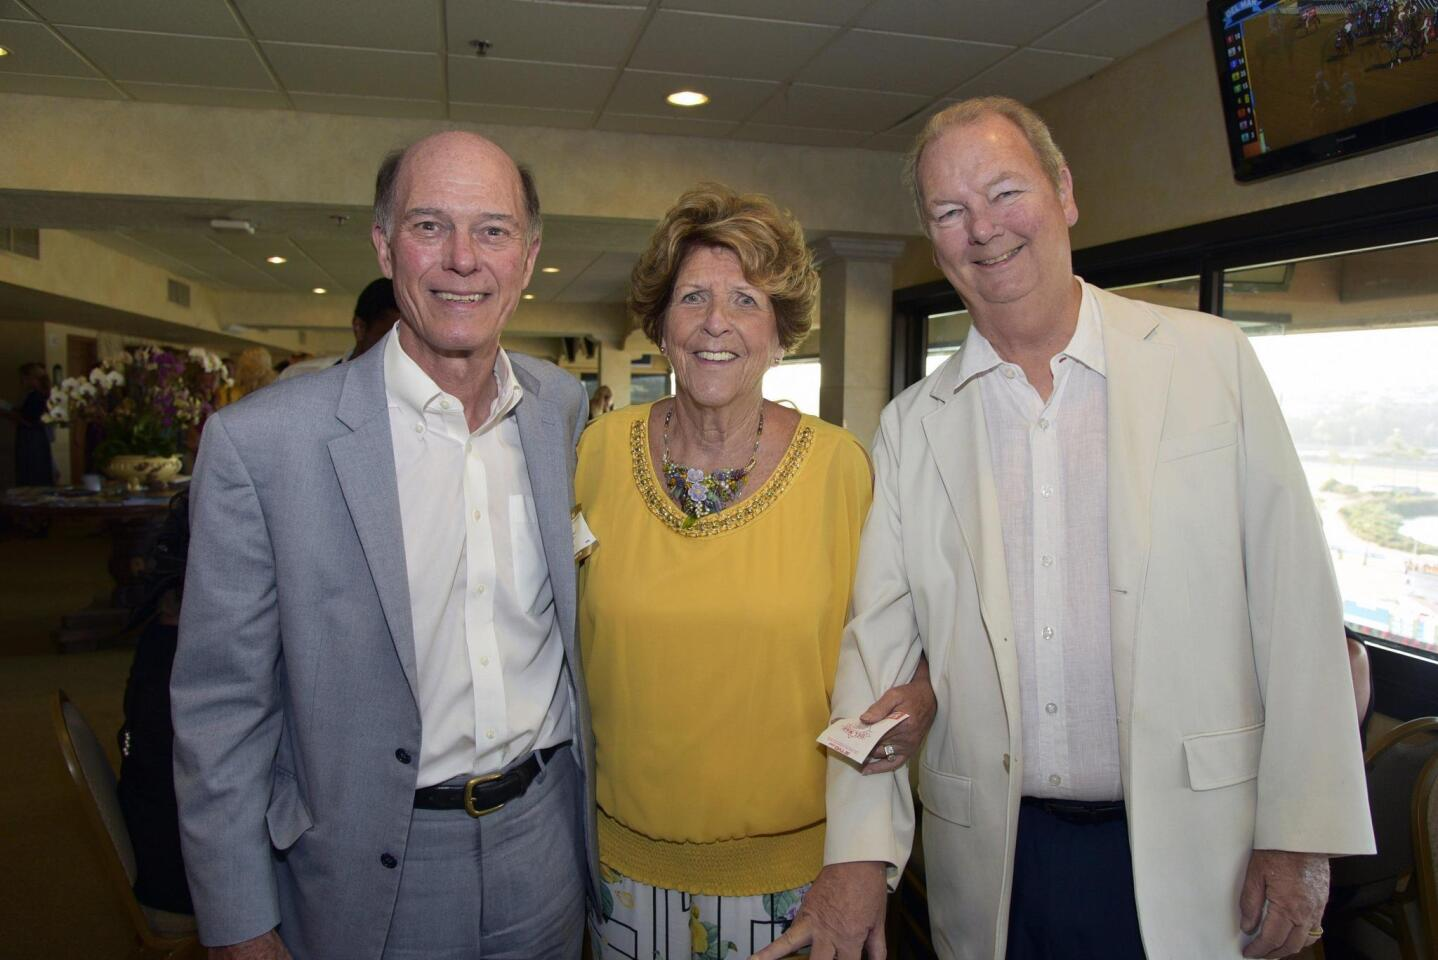 George Howard, Kathy and board member John Collins